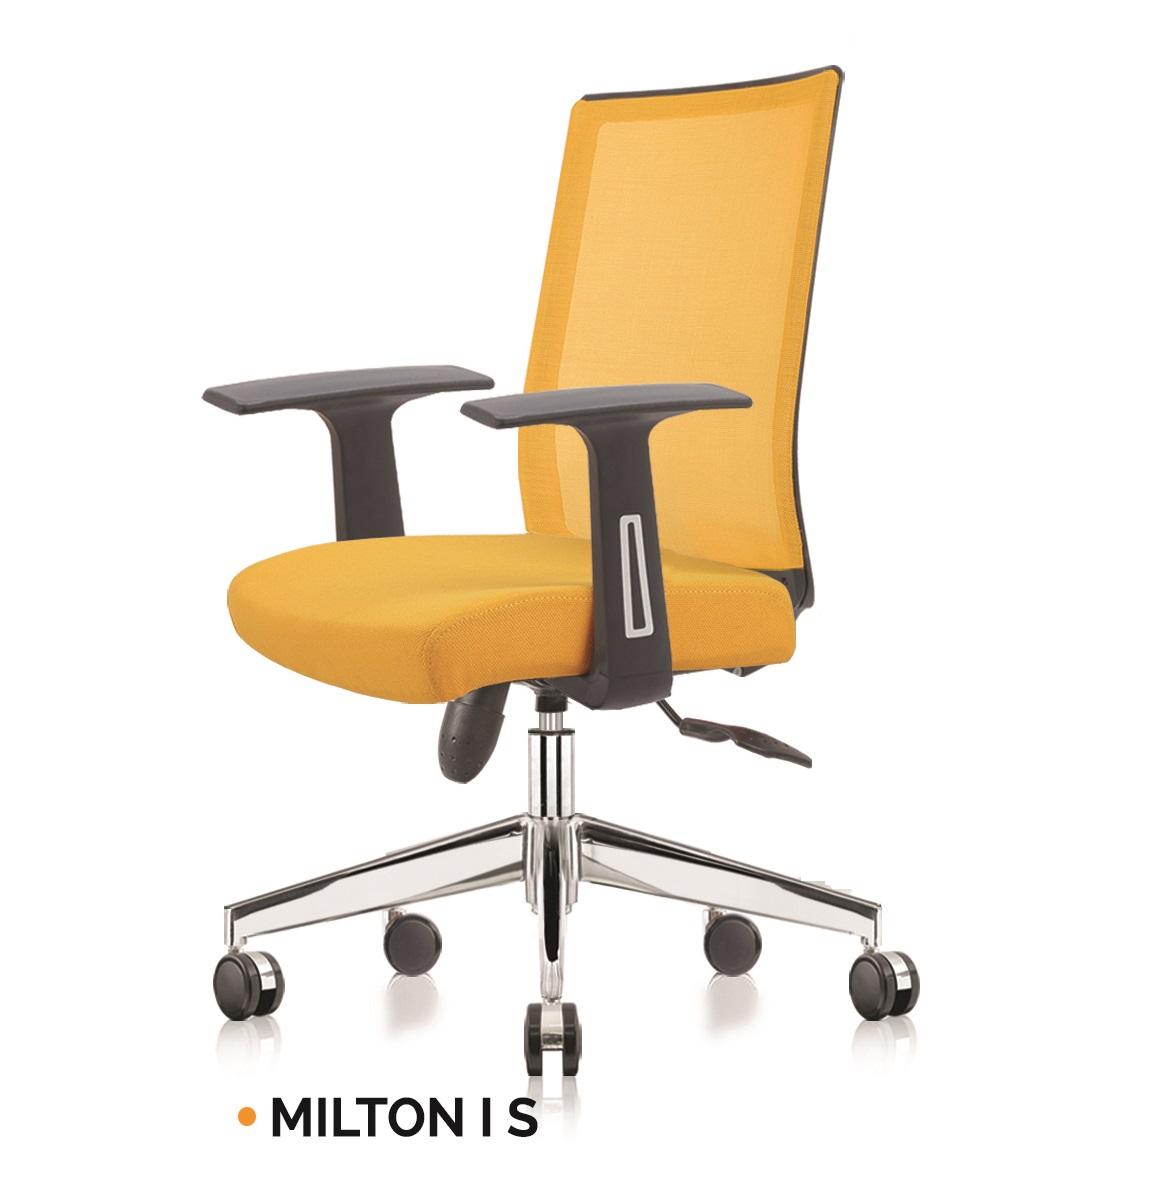 Kursi Kantor Ichiko Milton I S